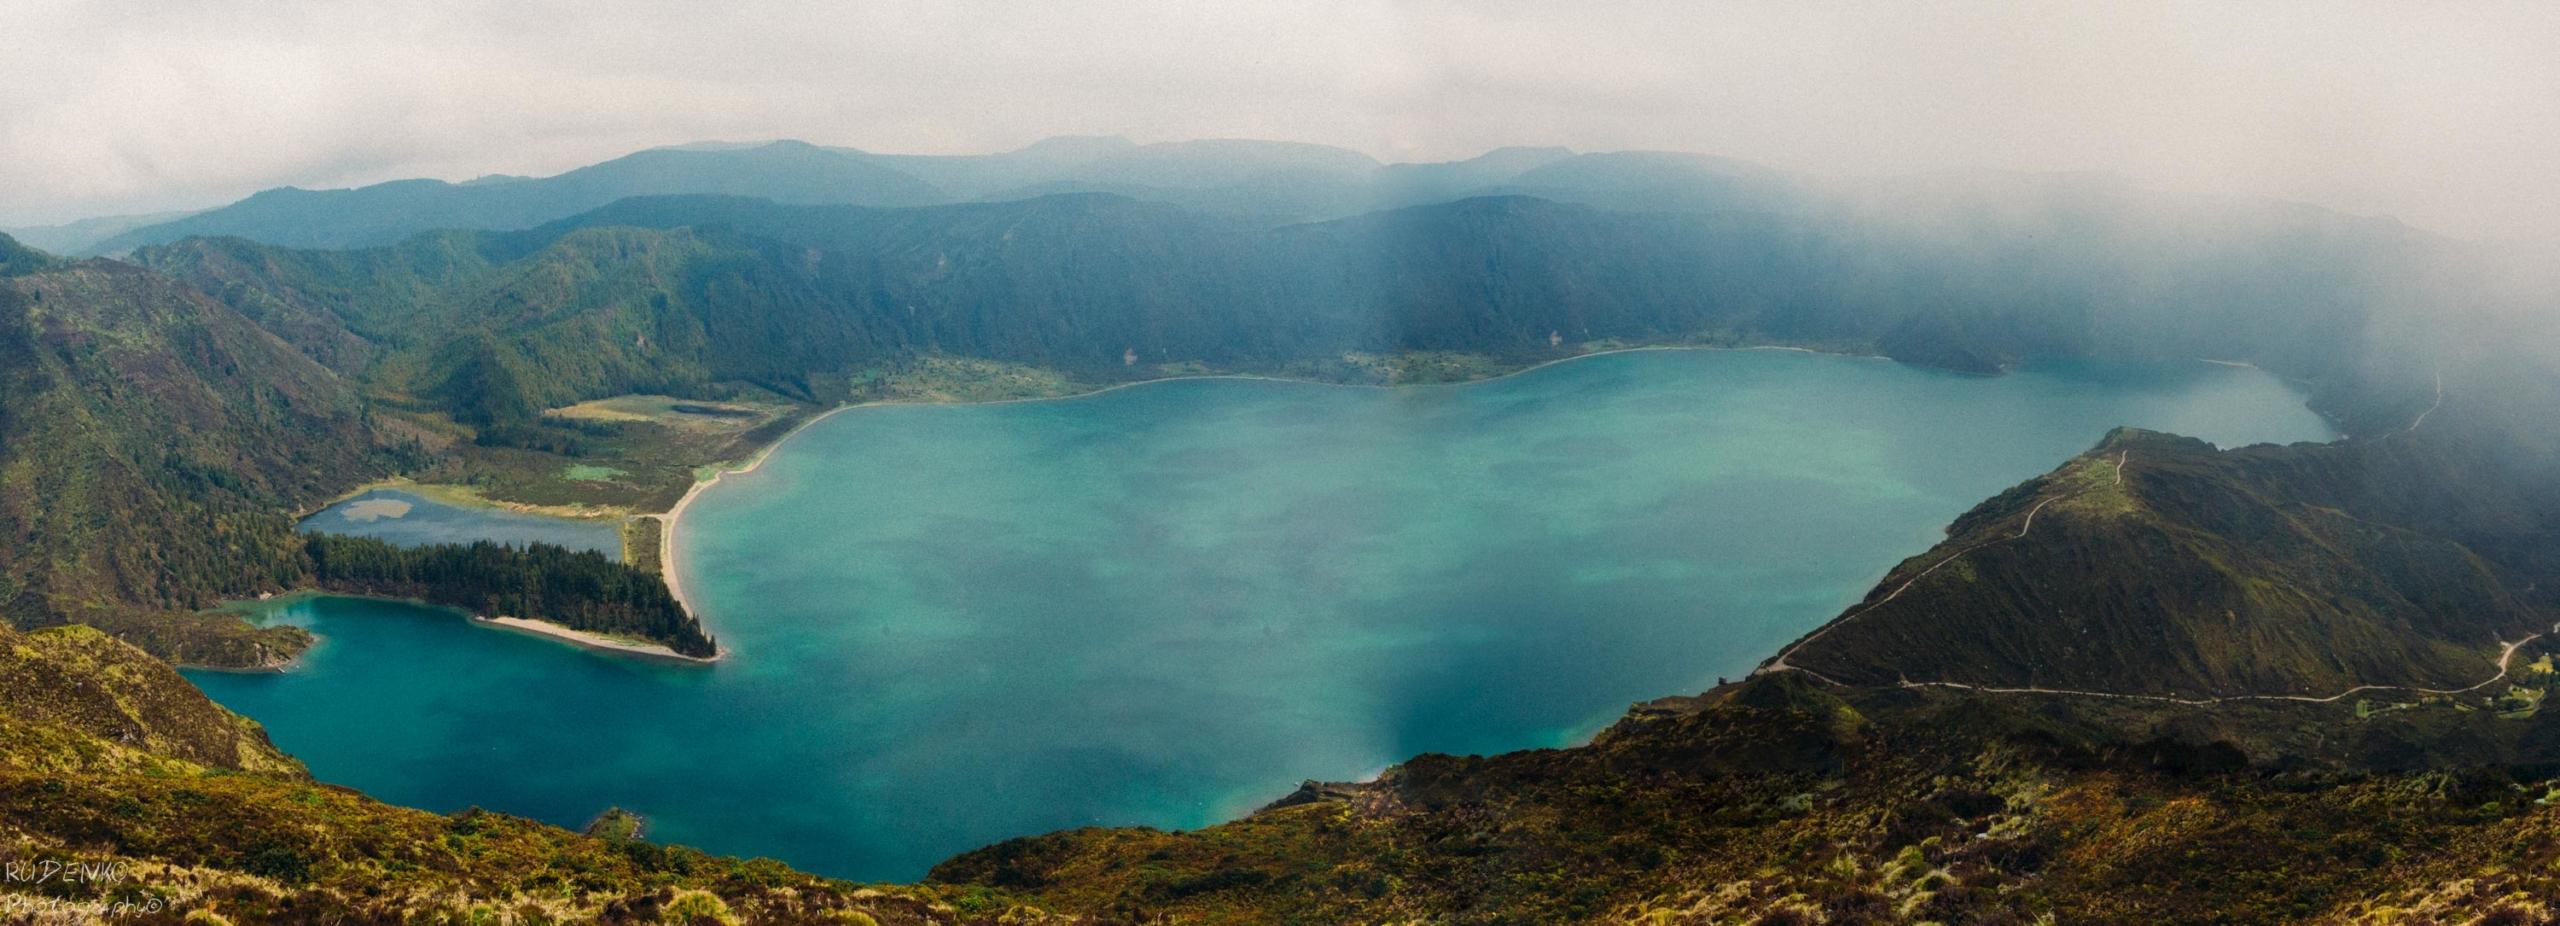 Lagoa do Fogo panorama, Sao Miguel, Azores, Portugal